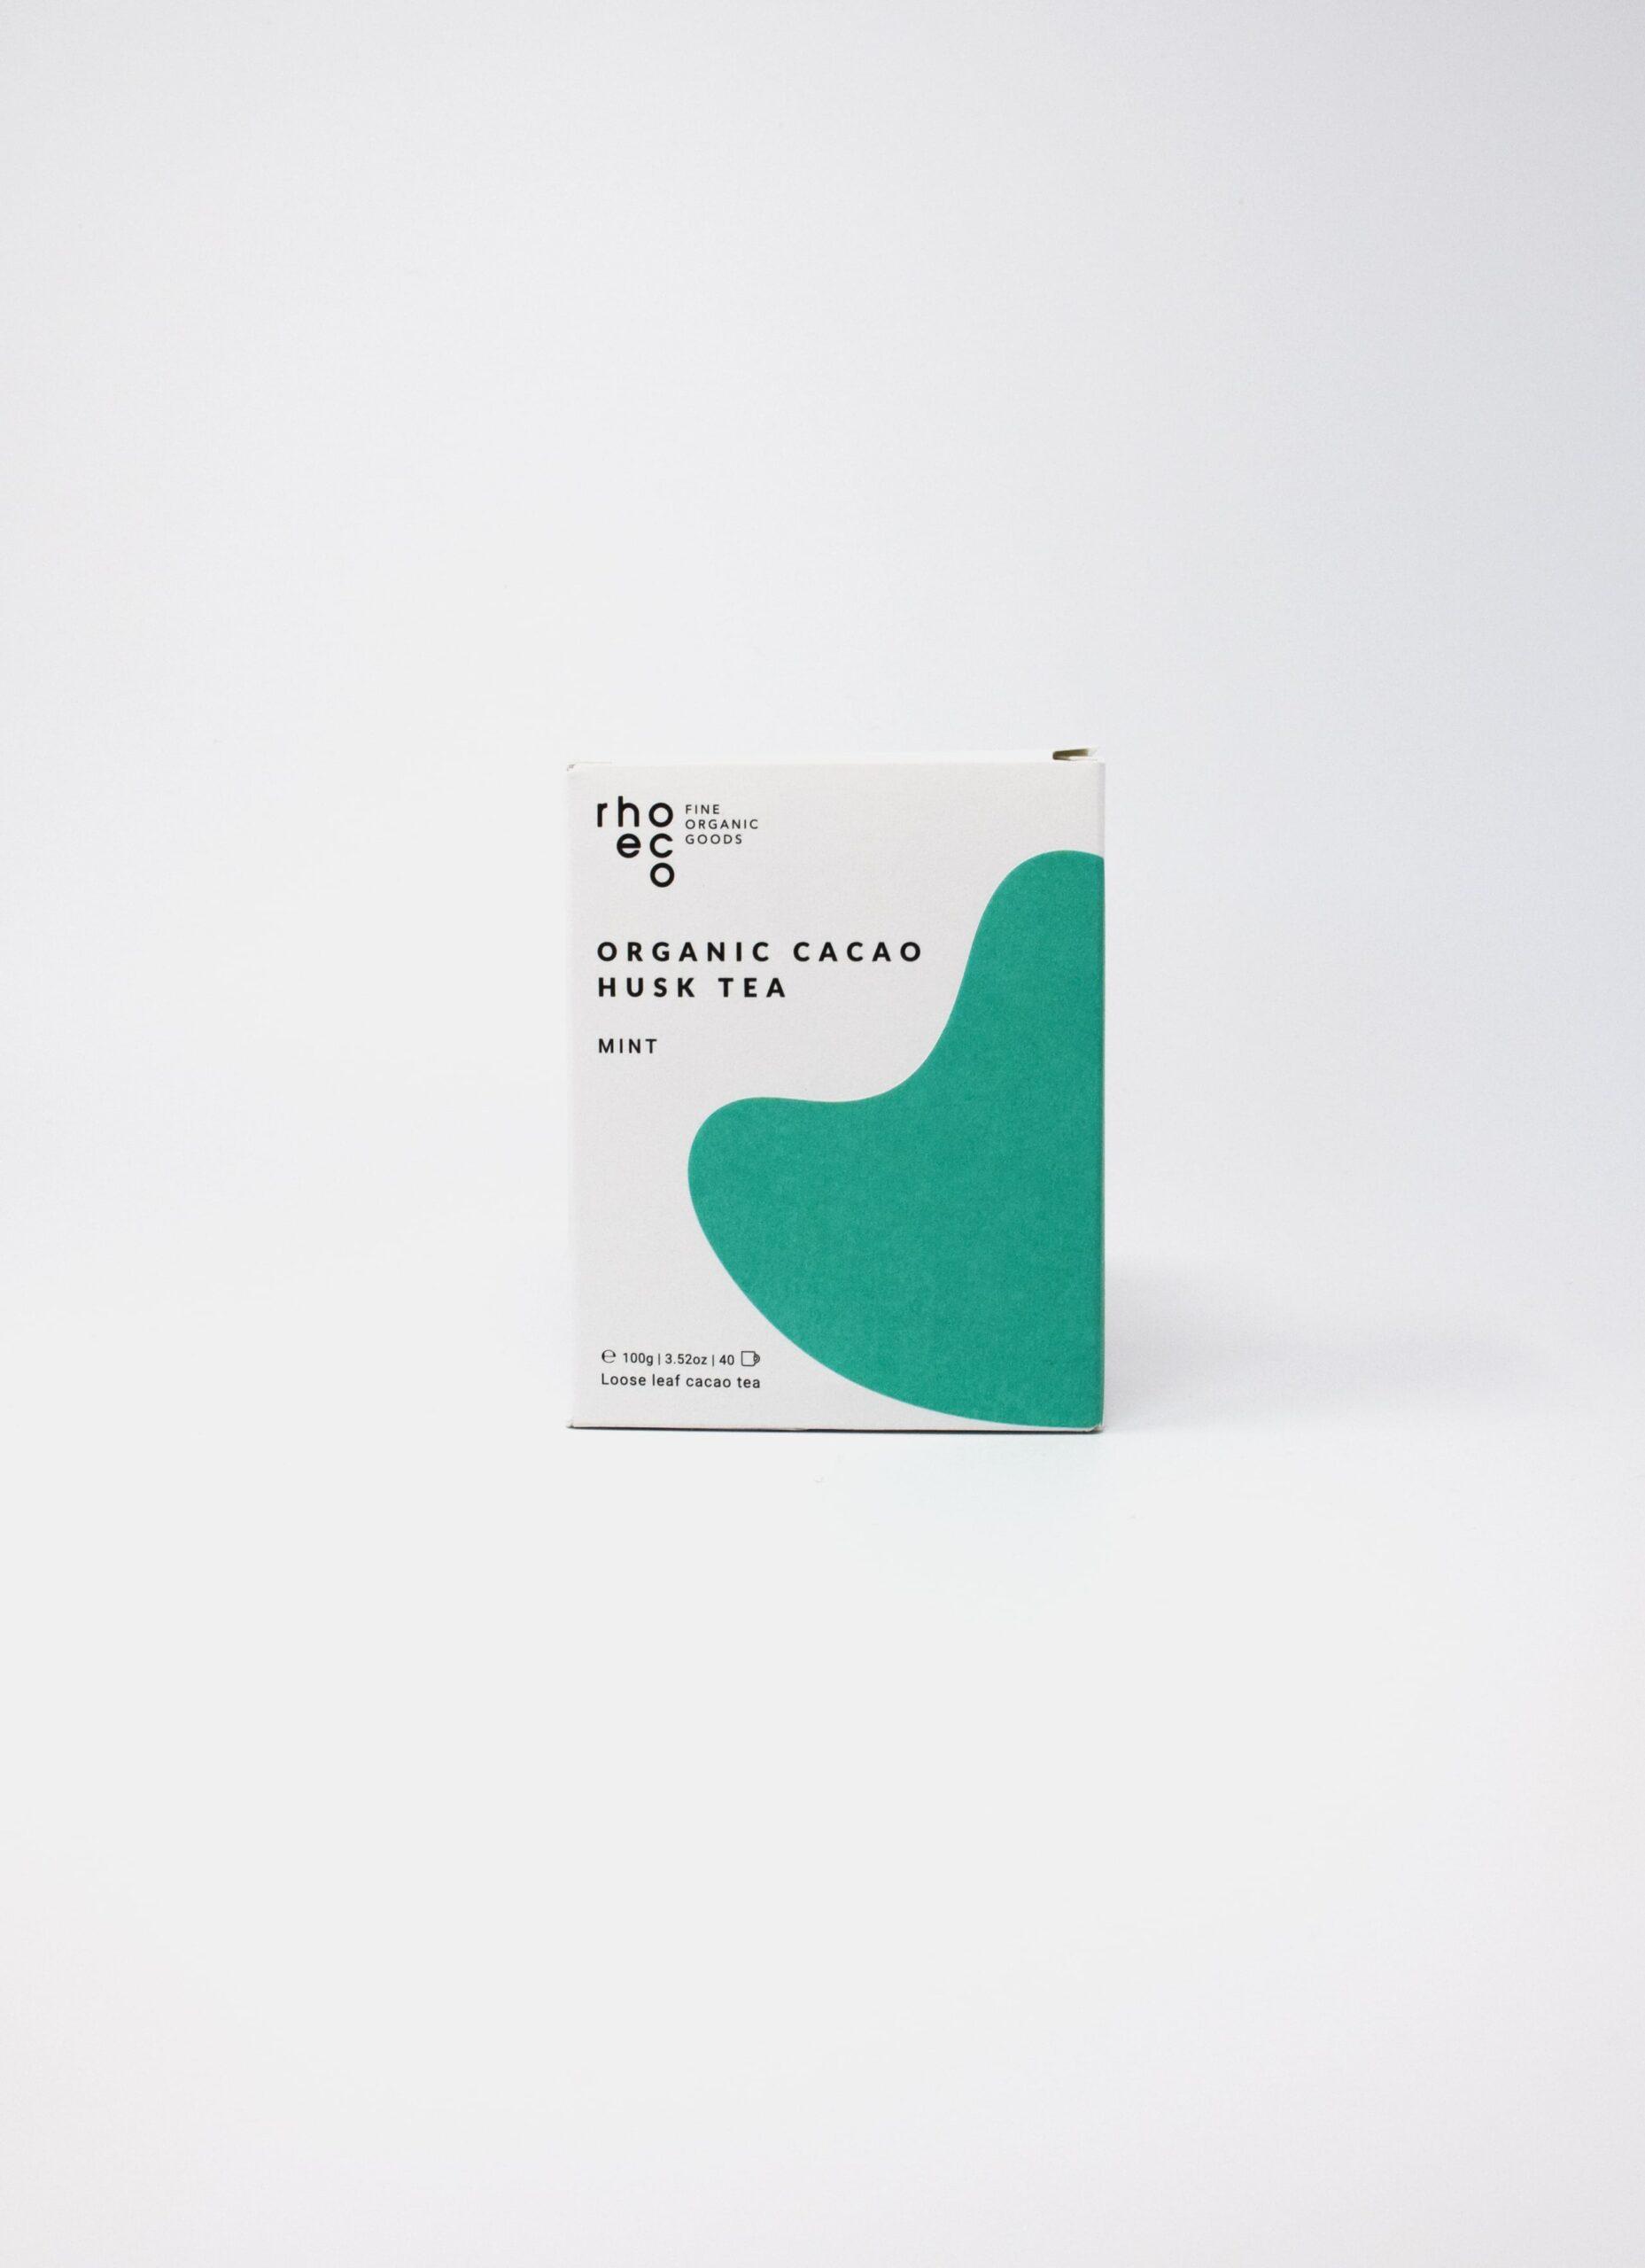 Rhoeco - Organic Cacao Husk Tea - Mint - 100g